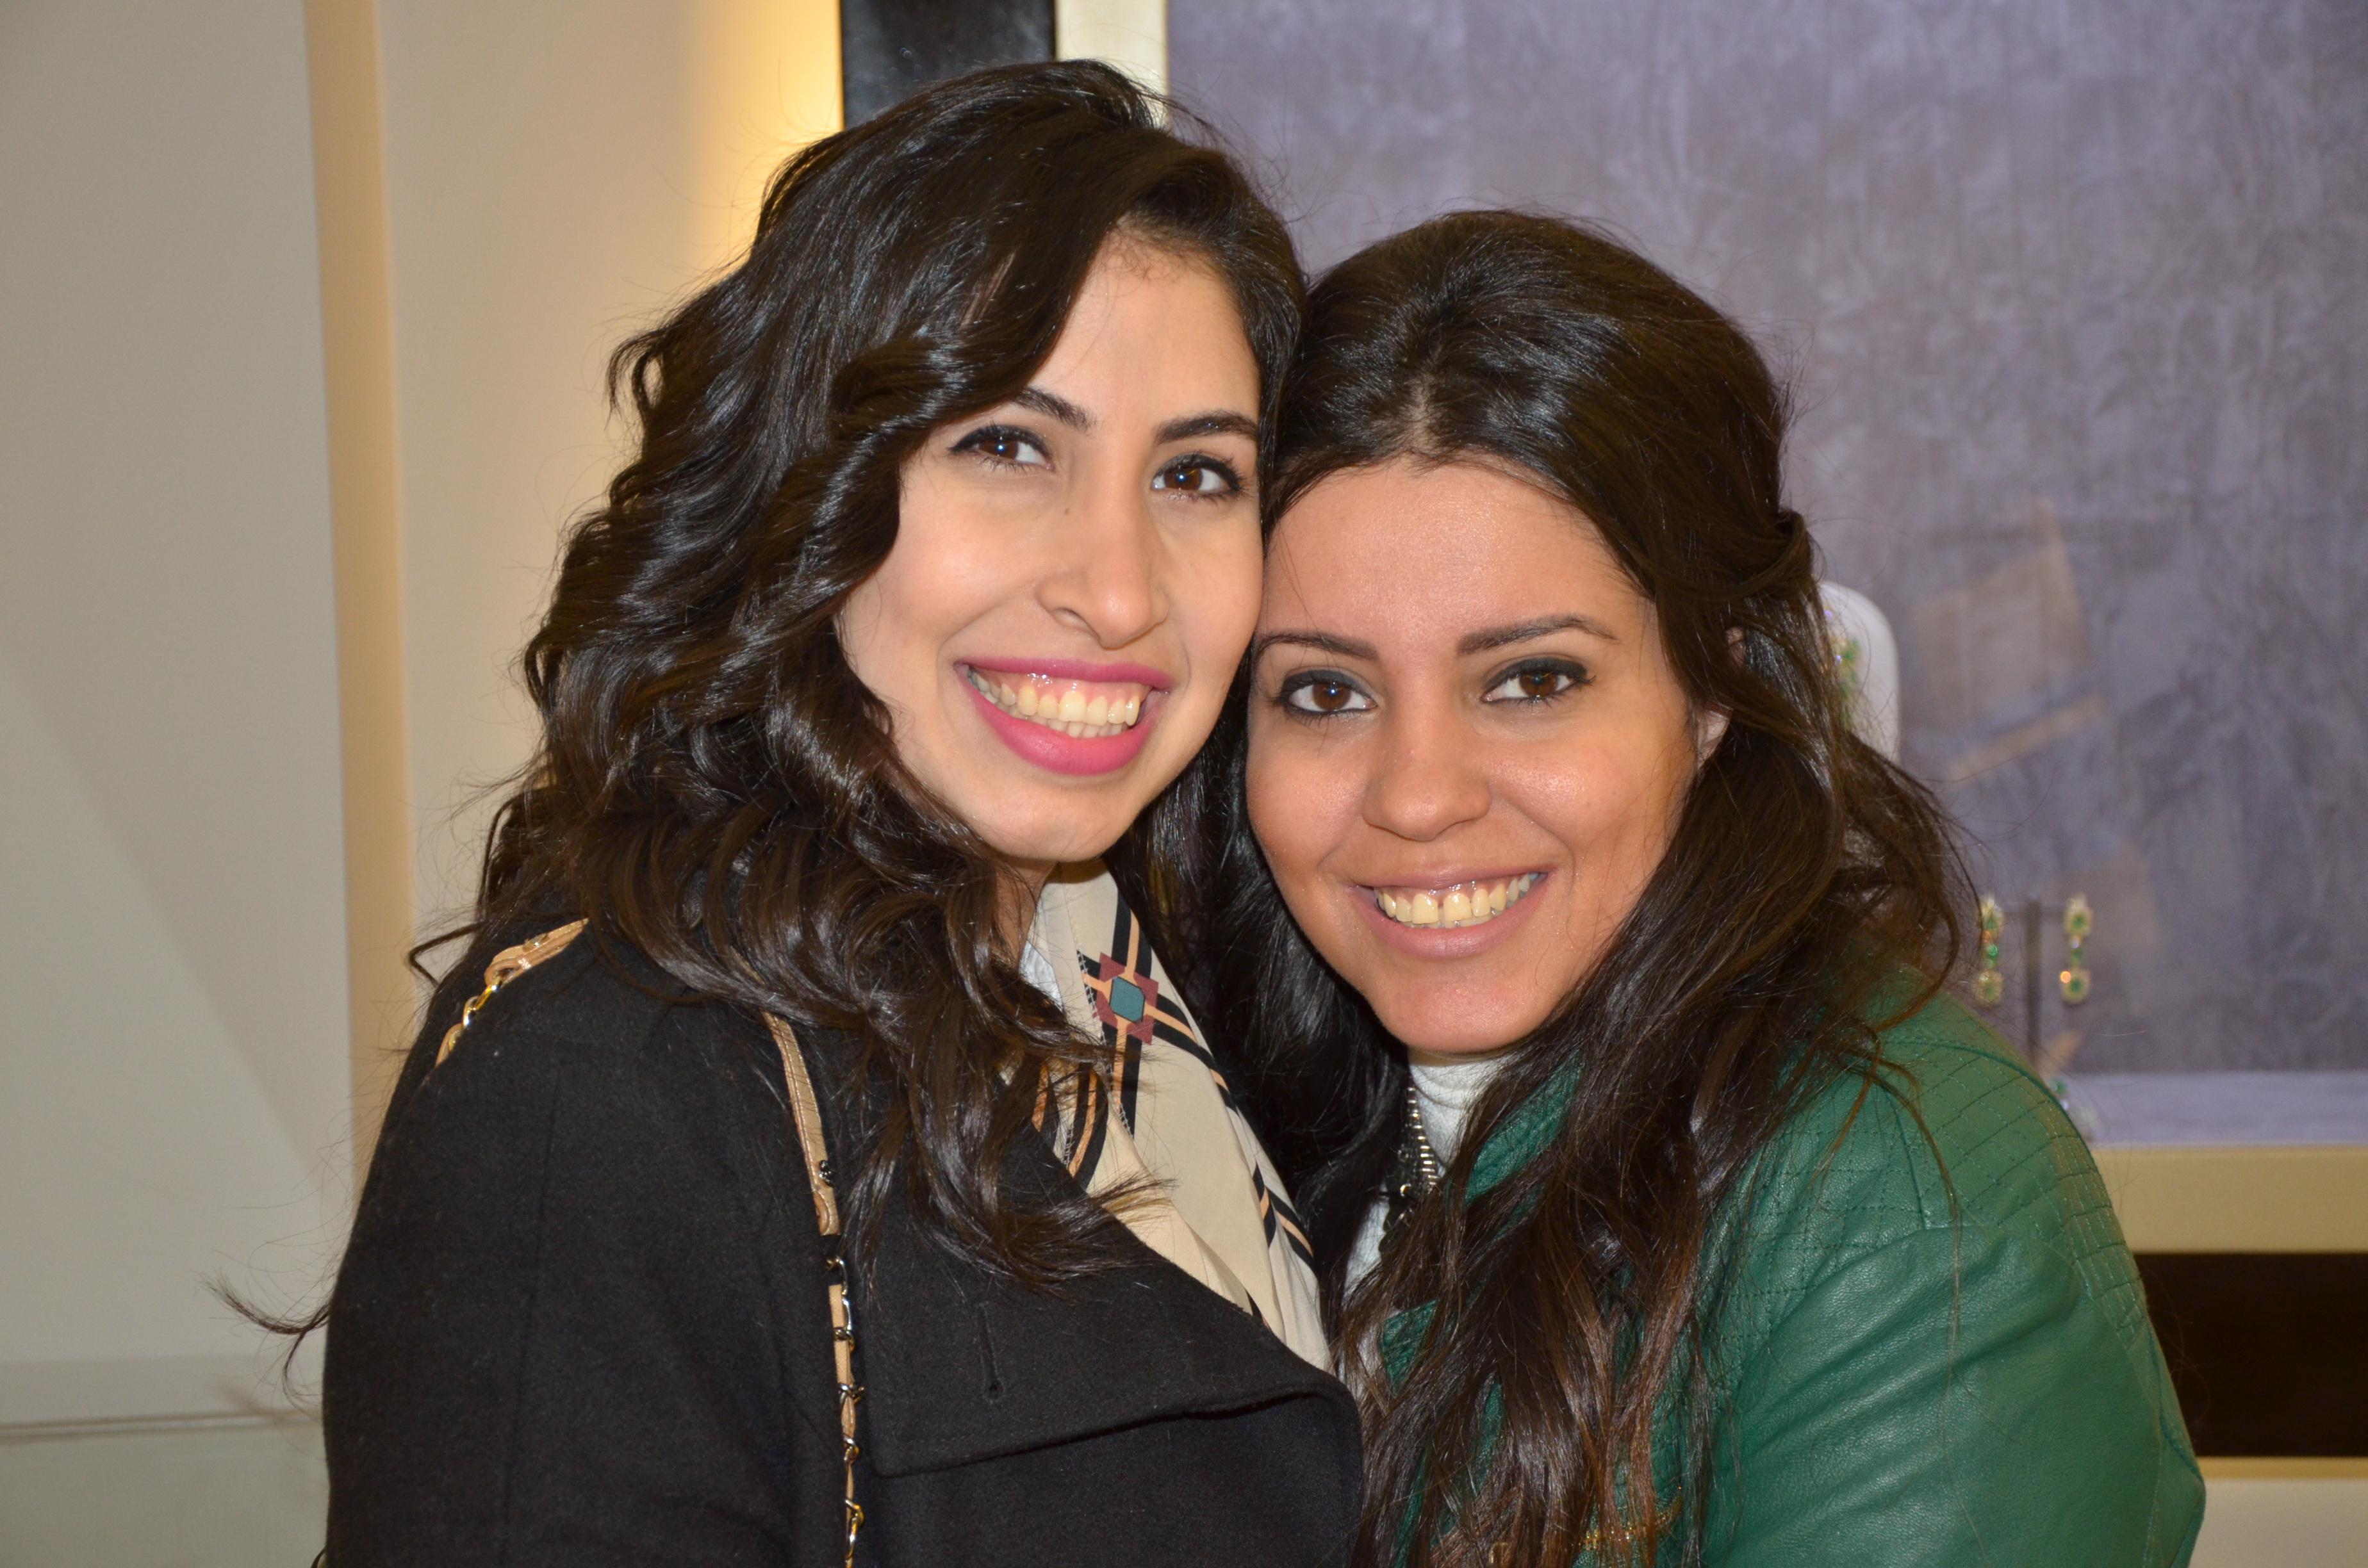 Ms. Passant Adel & Ms. Amira El Tohamy